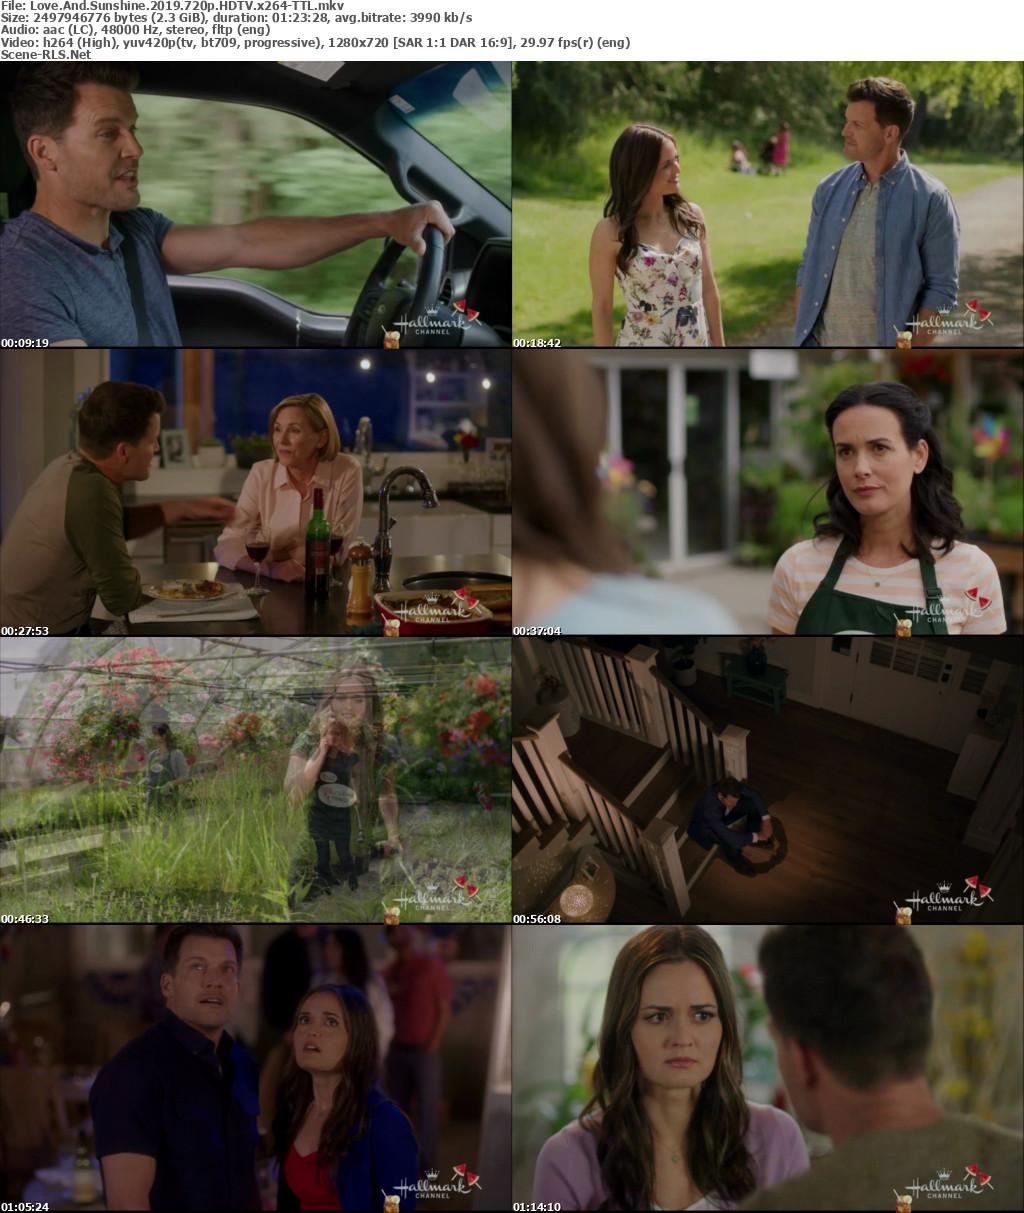 Love And Sunshine 2019 720p HDTV x264-TTL - Scene Release